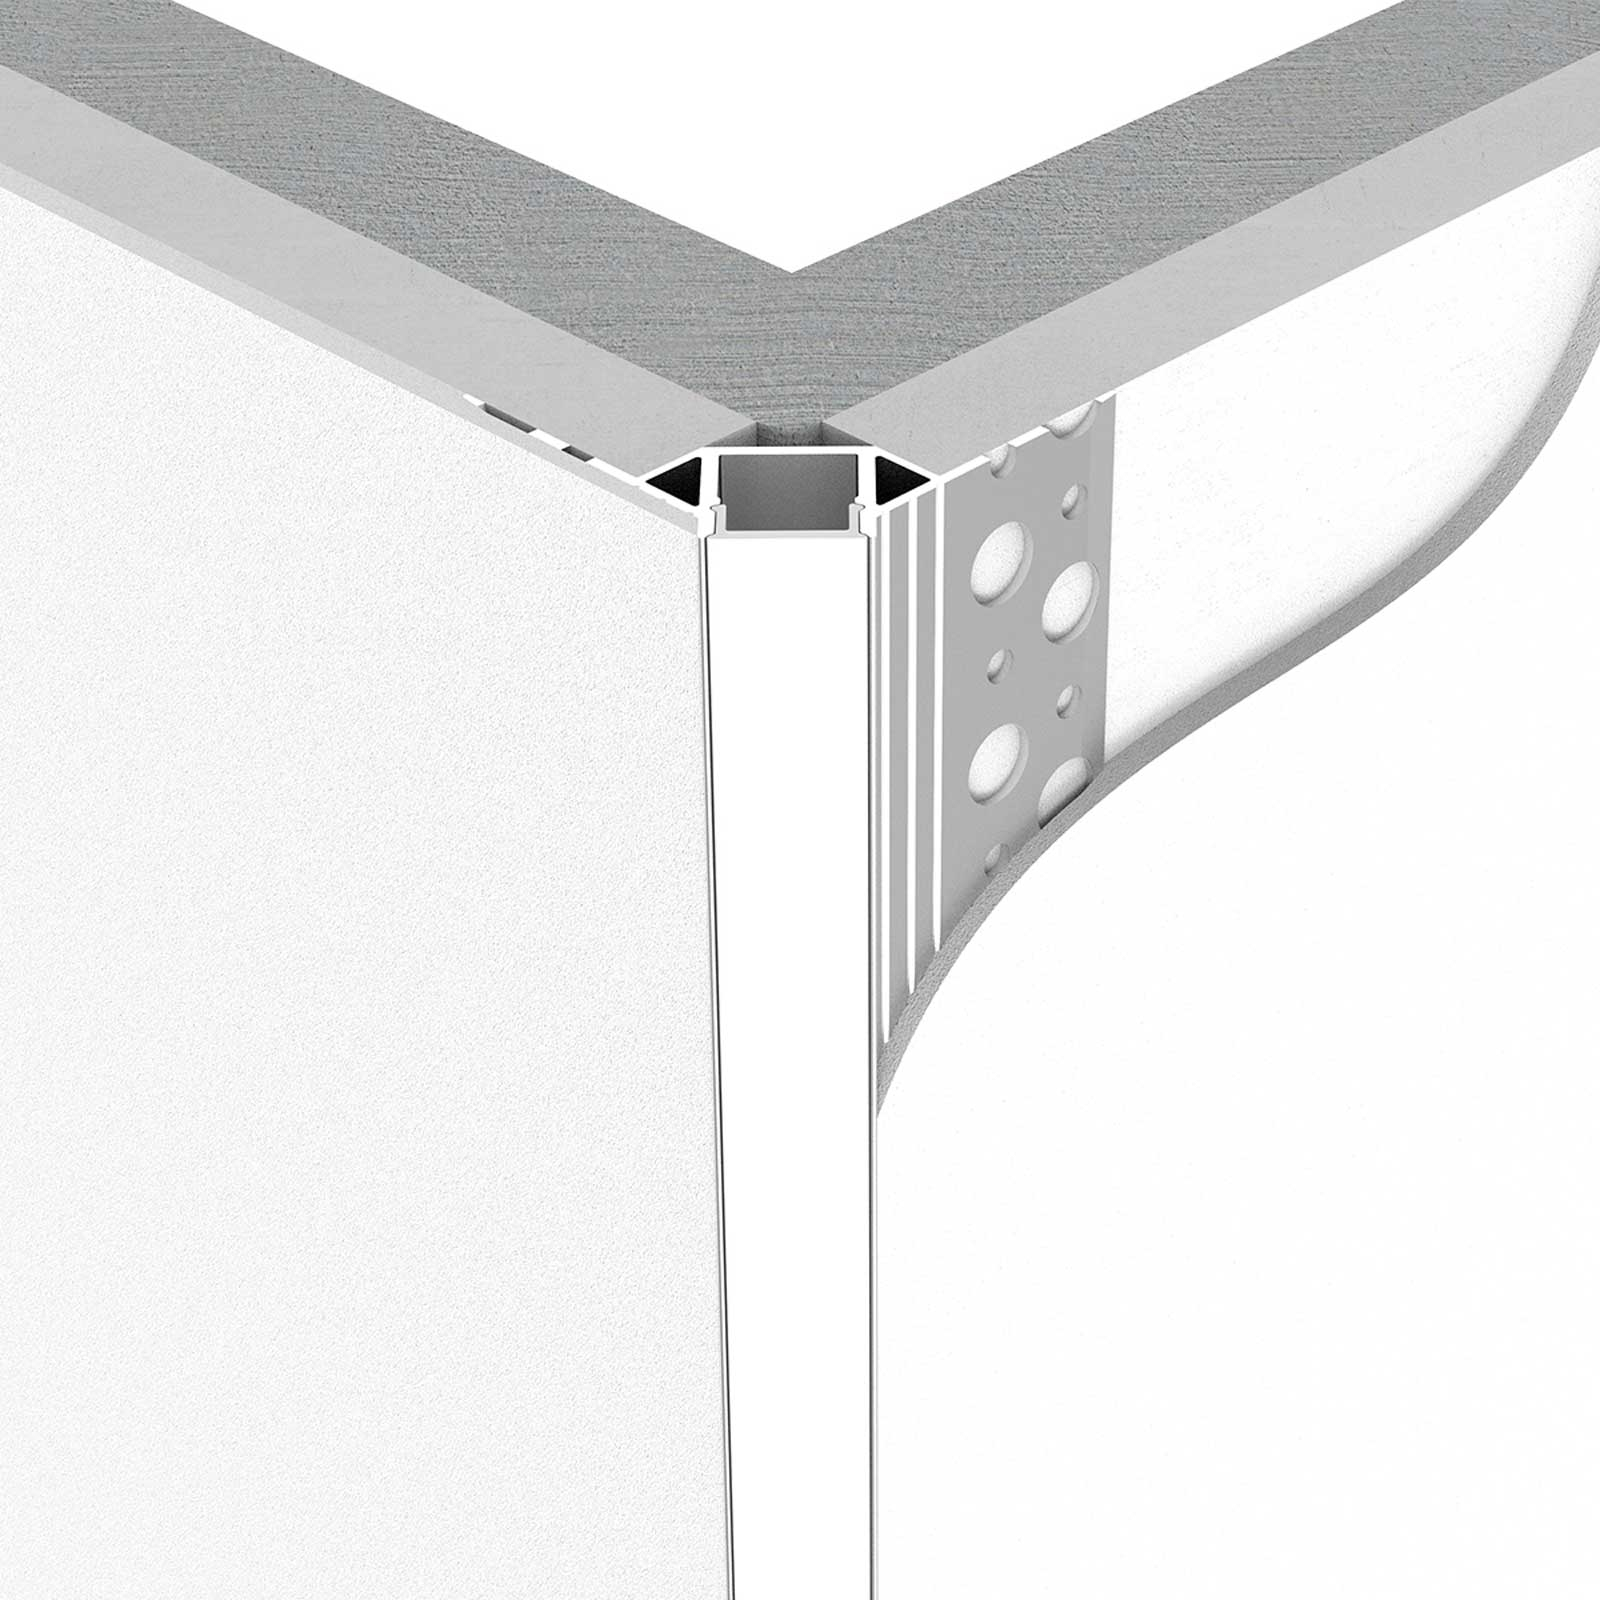 LED stucprofiel / Gips profiel  - BUITENHOEK 9 mm